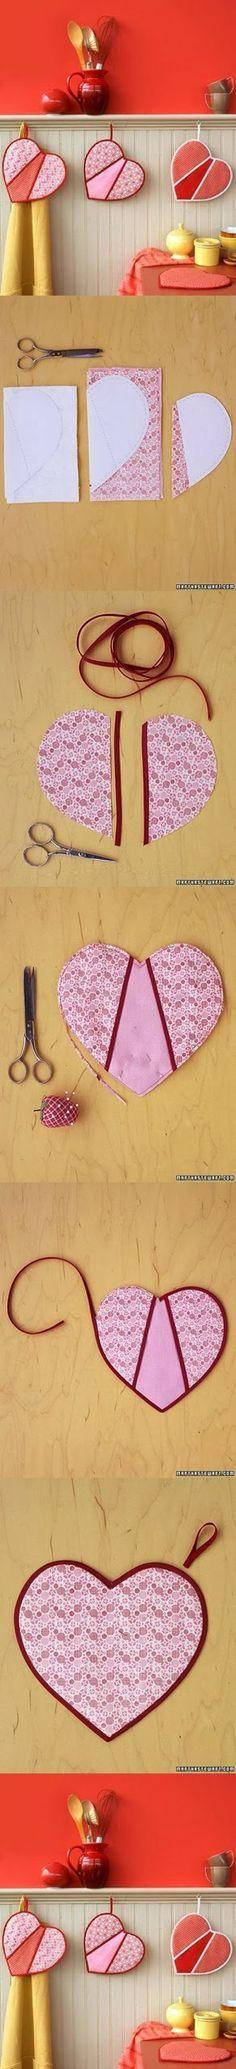 Heart Shaped Pot Holders tutorial